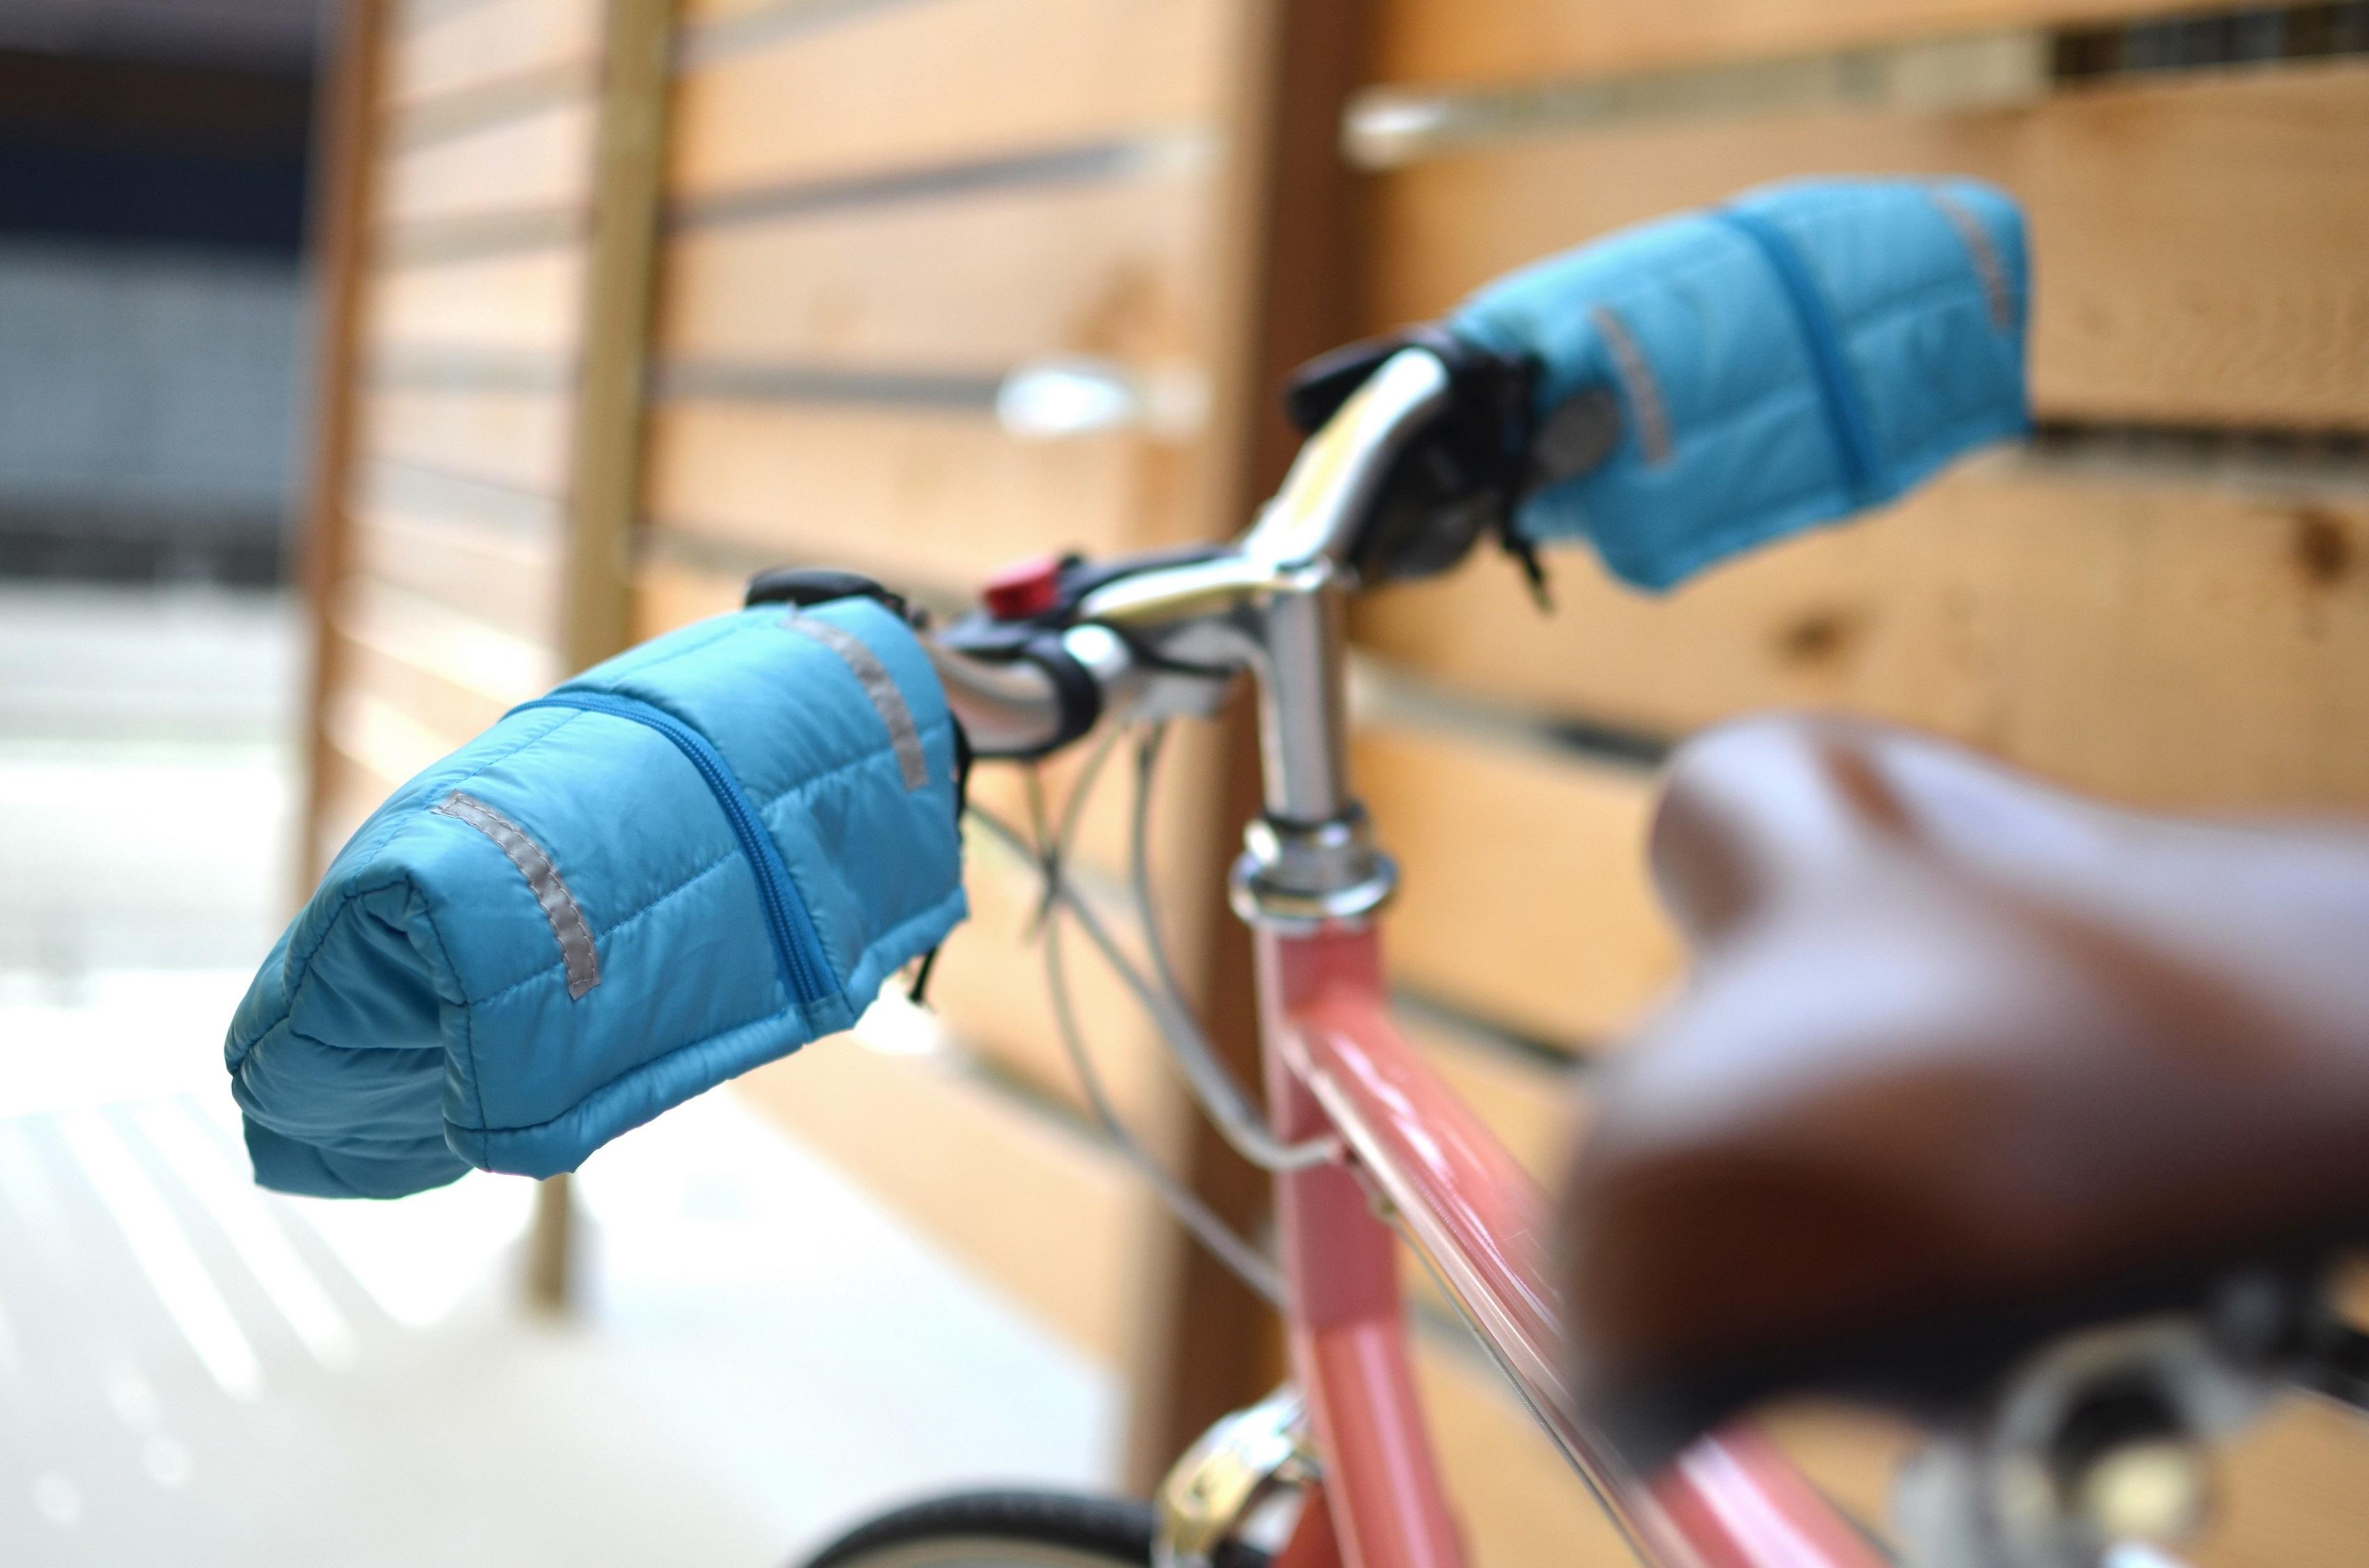 K4100 サイクルジャケット ハンドルカバー キャンディピンク